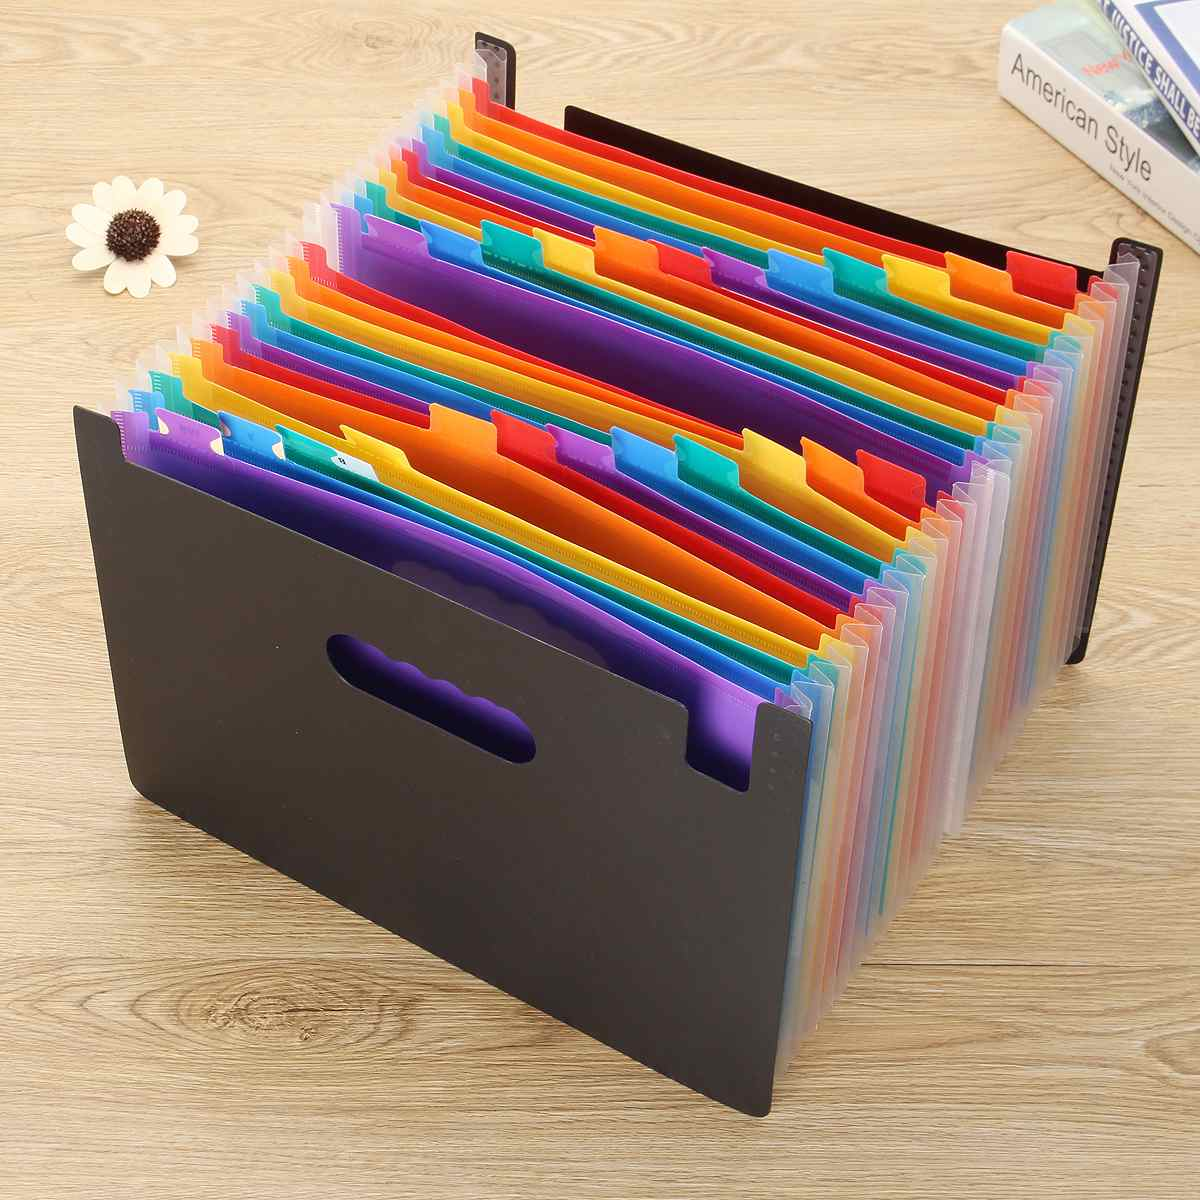 24 Pockets Expanding File Folder A4 Organizer Portable Rainbow Organ Business File Document Holder Storage Bag